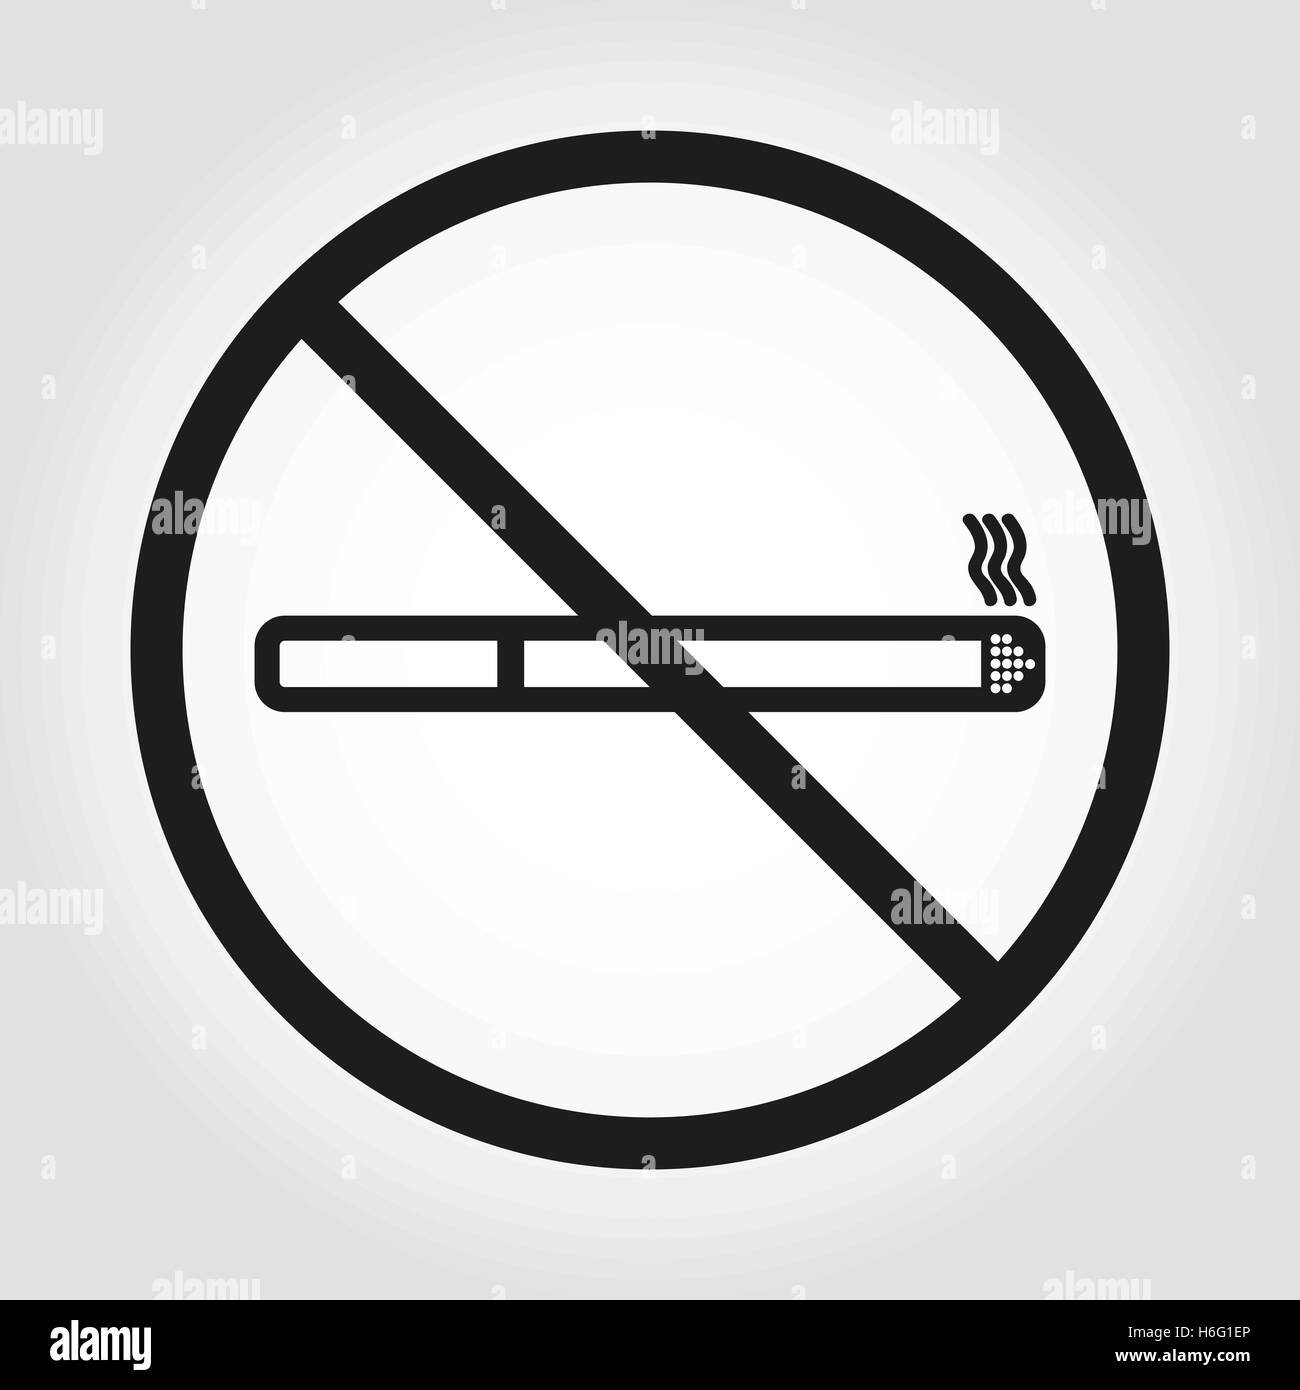 No smoke icon stop smoking symbol vector icon for public places no smoke icon stop smoking symbol vector icon for public places biocorpaavc Image collections